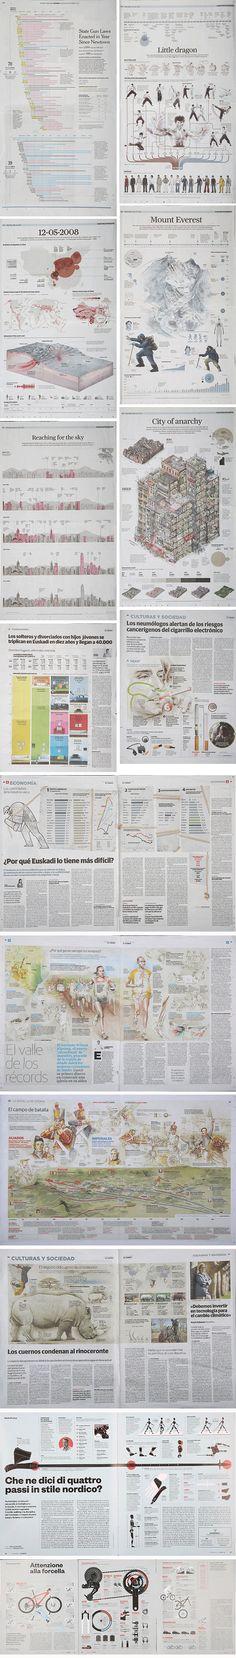 Malofiej Awards #22 for Data Visualization  Infographics: Gold winners